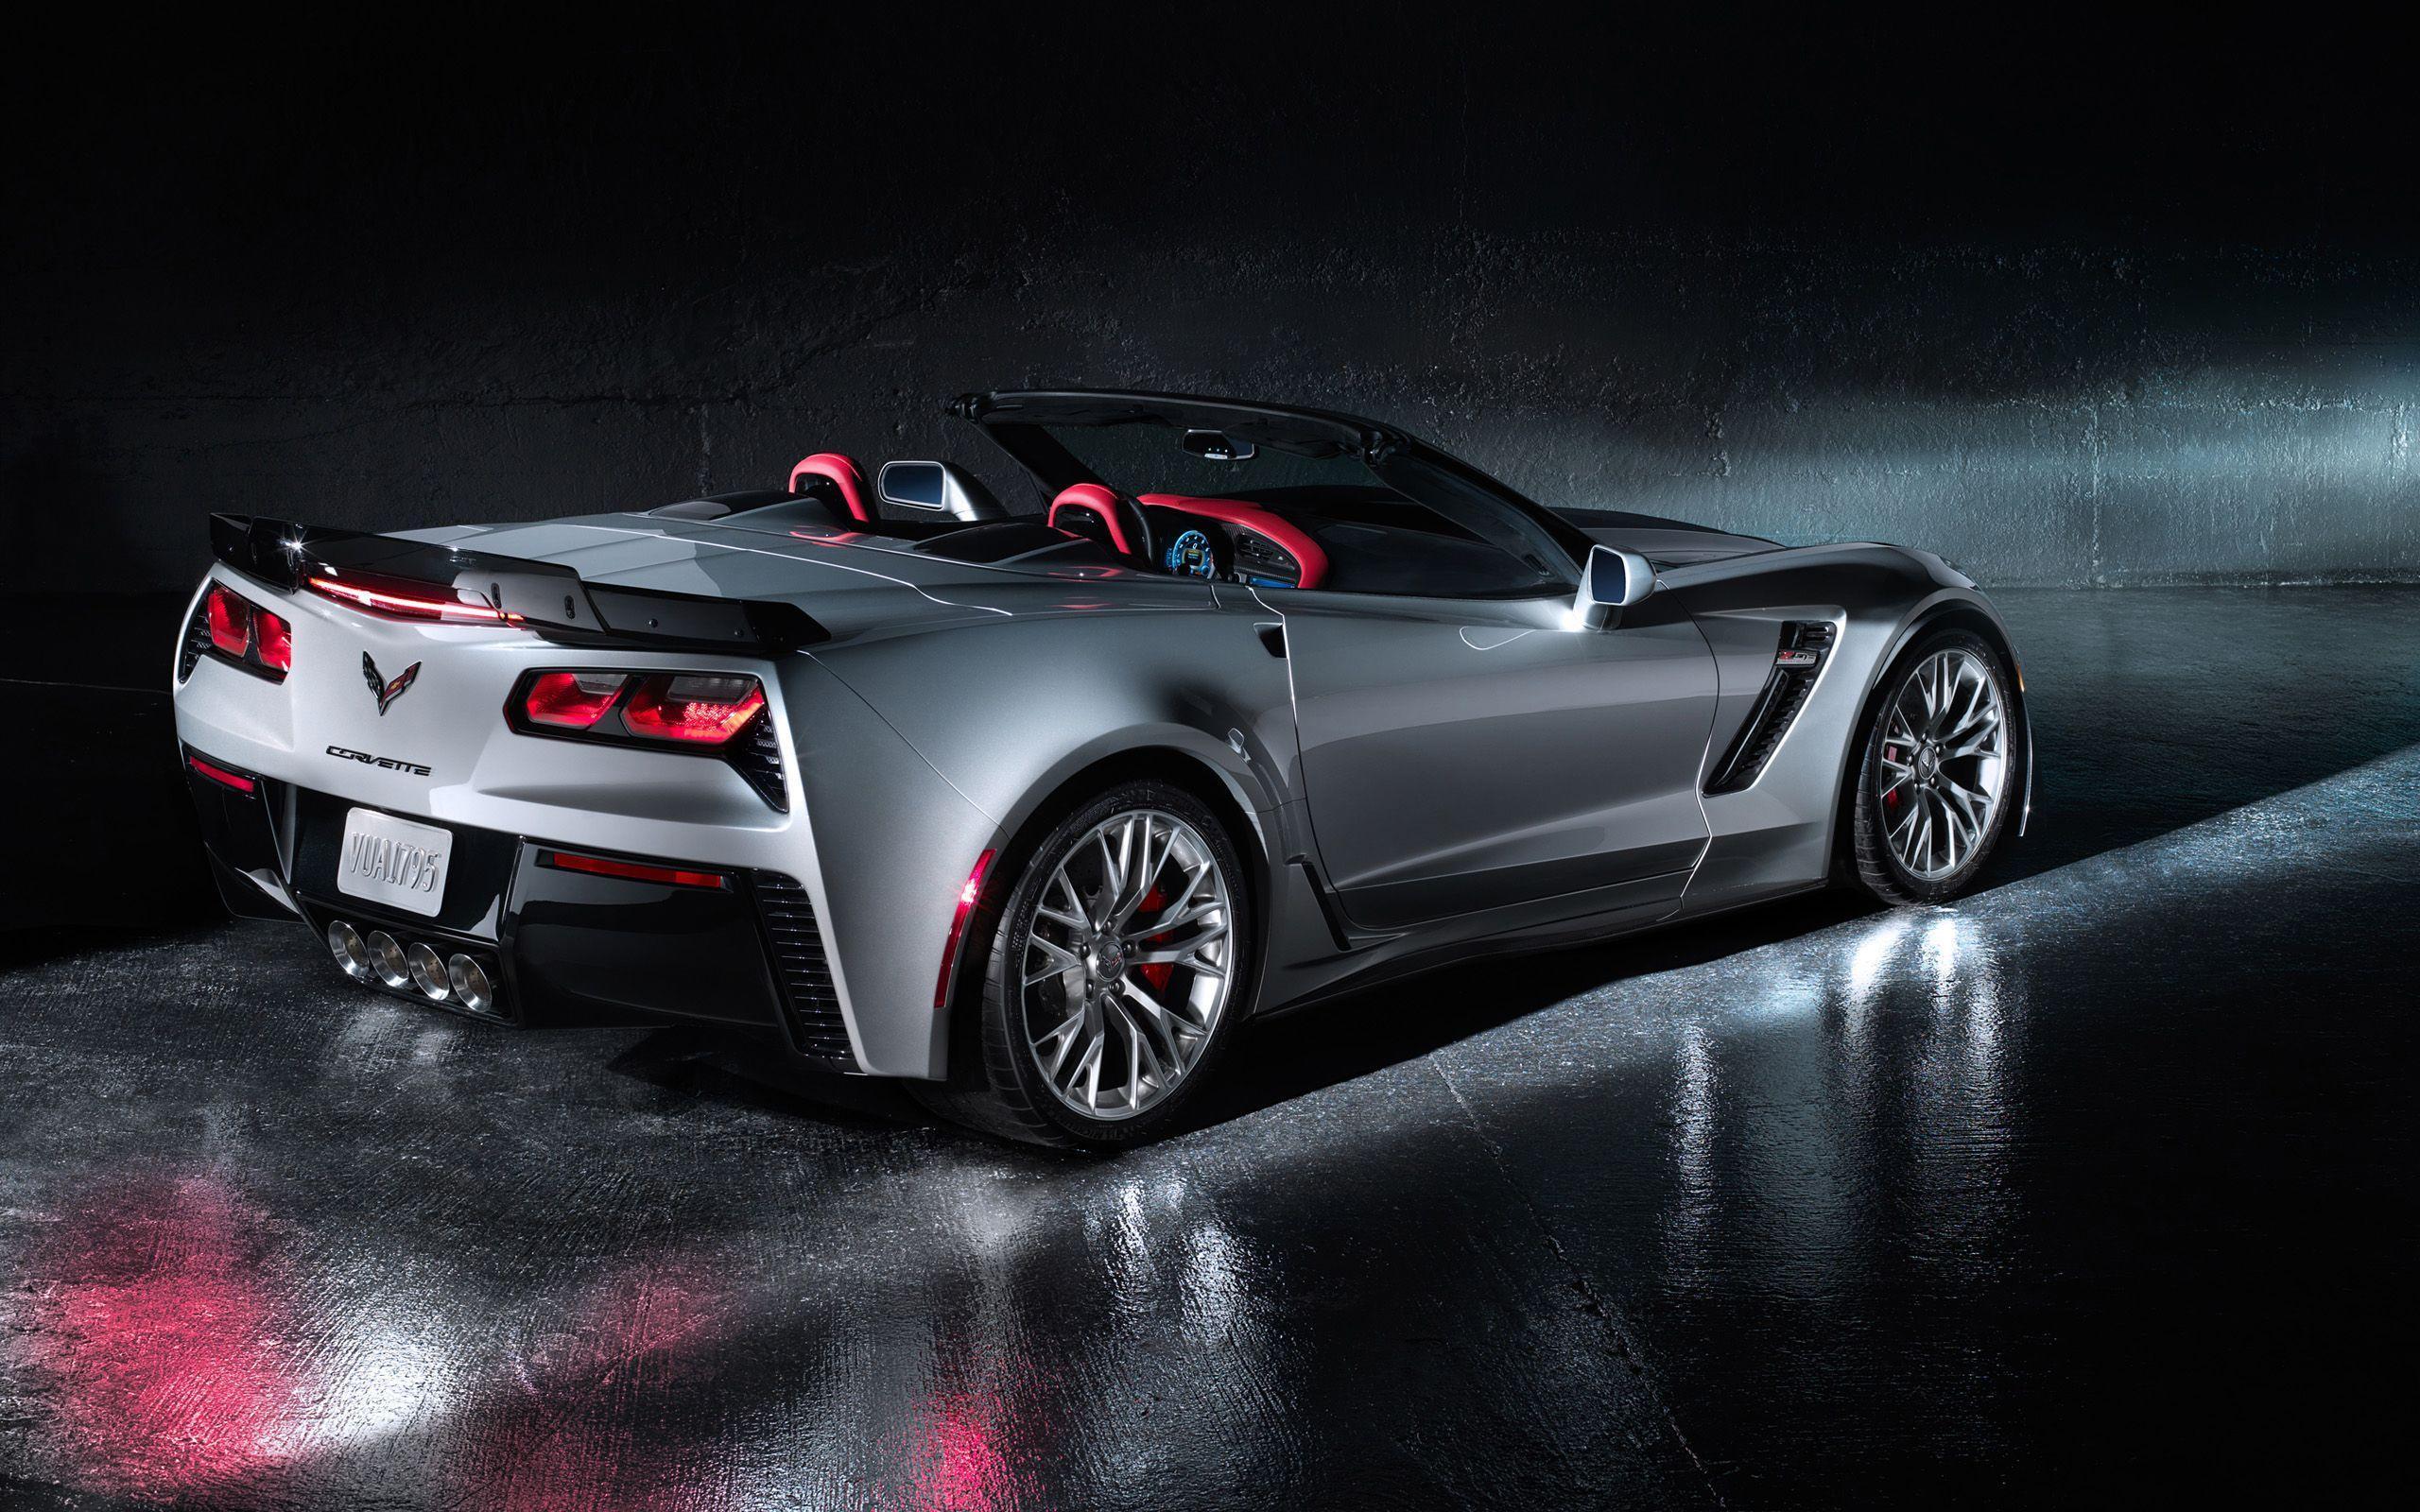 black corvette zr1 wallpapers - photo #38